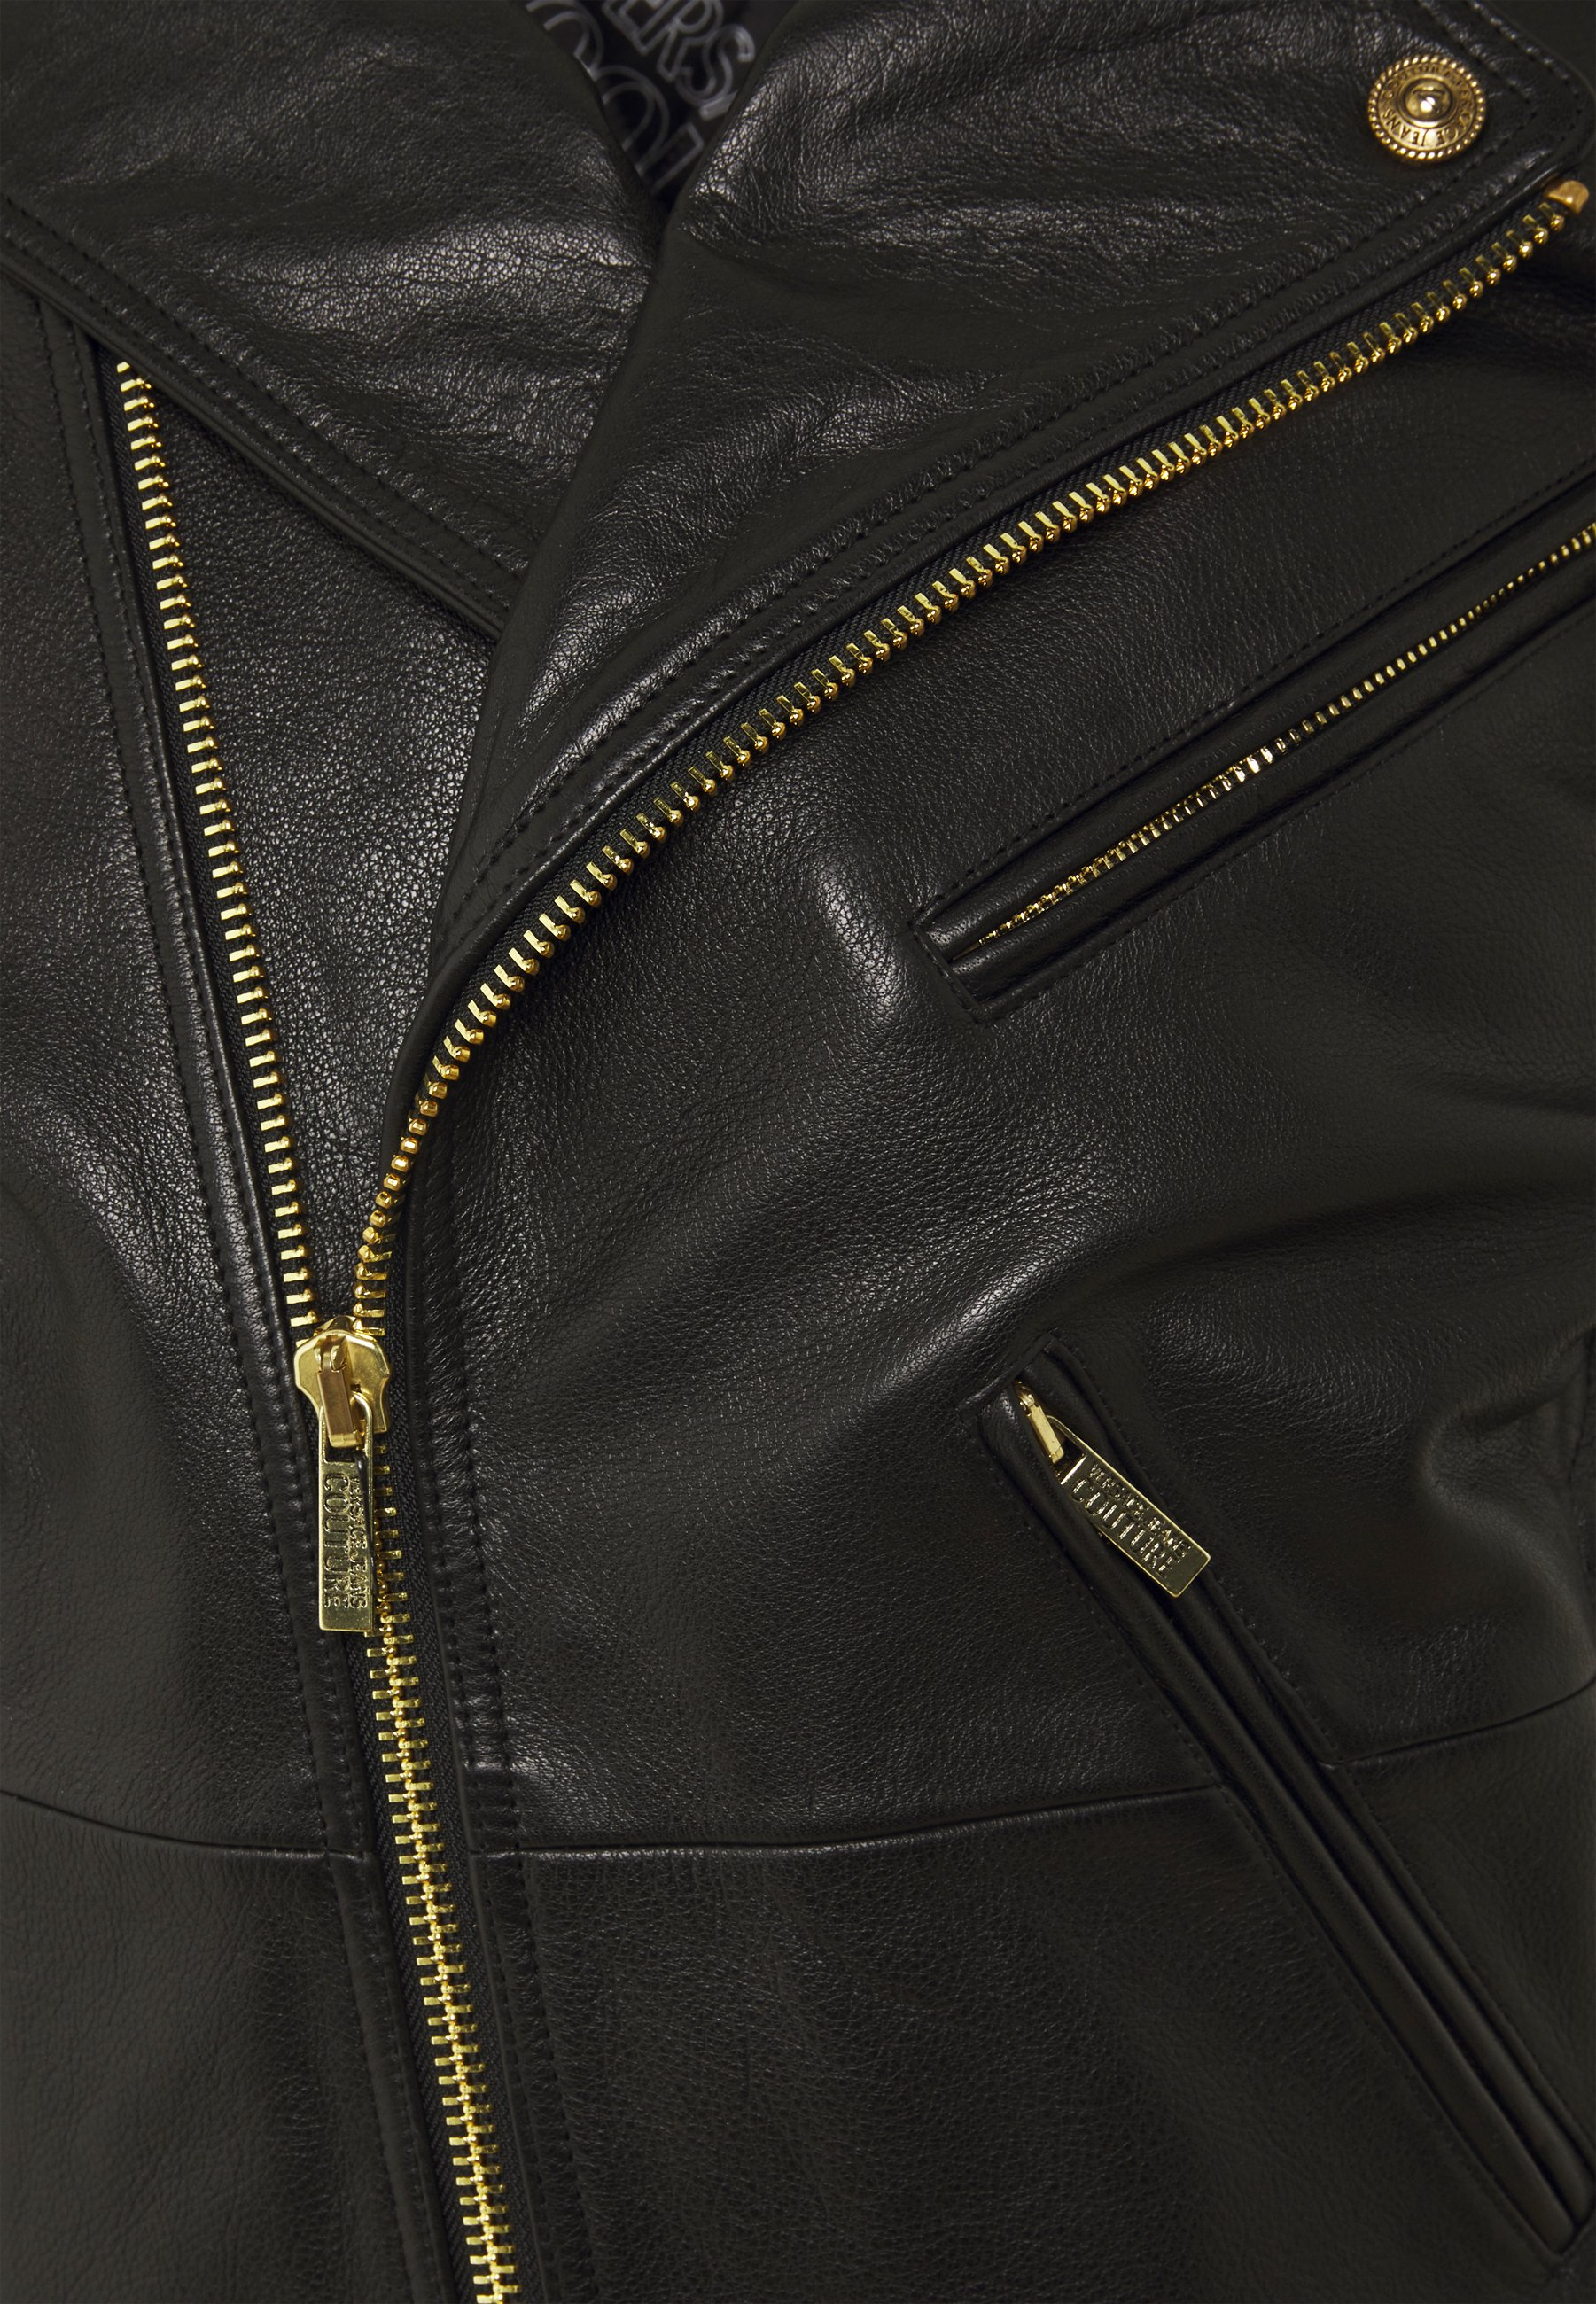 Versace Jeans Couture Skinnjakke nero Zalando.no